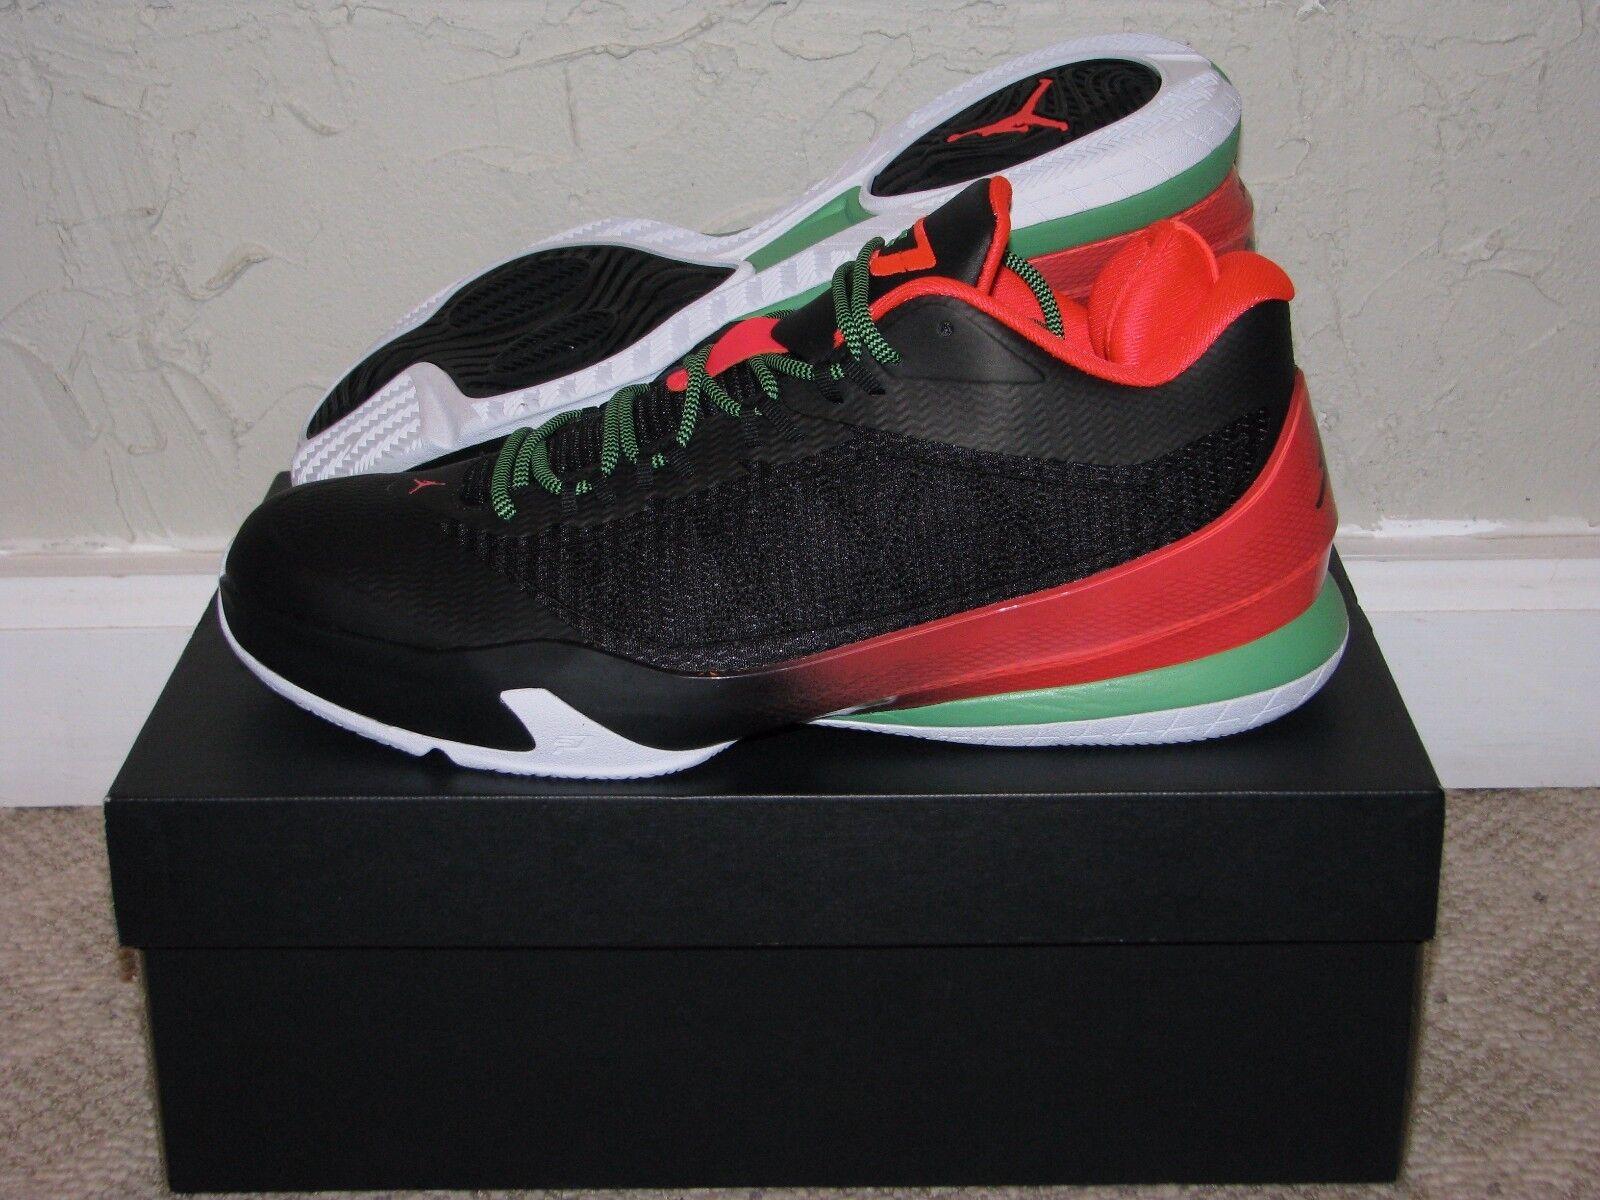 Nike Air Jordan CP3 VIII 8 Blk Infrared Mens Size 10 DS NEW  VI VII Chris Paul